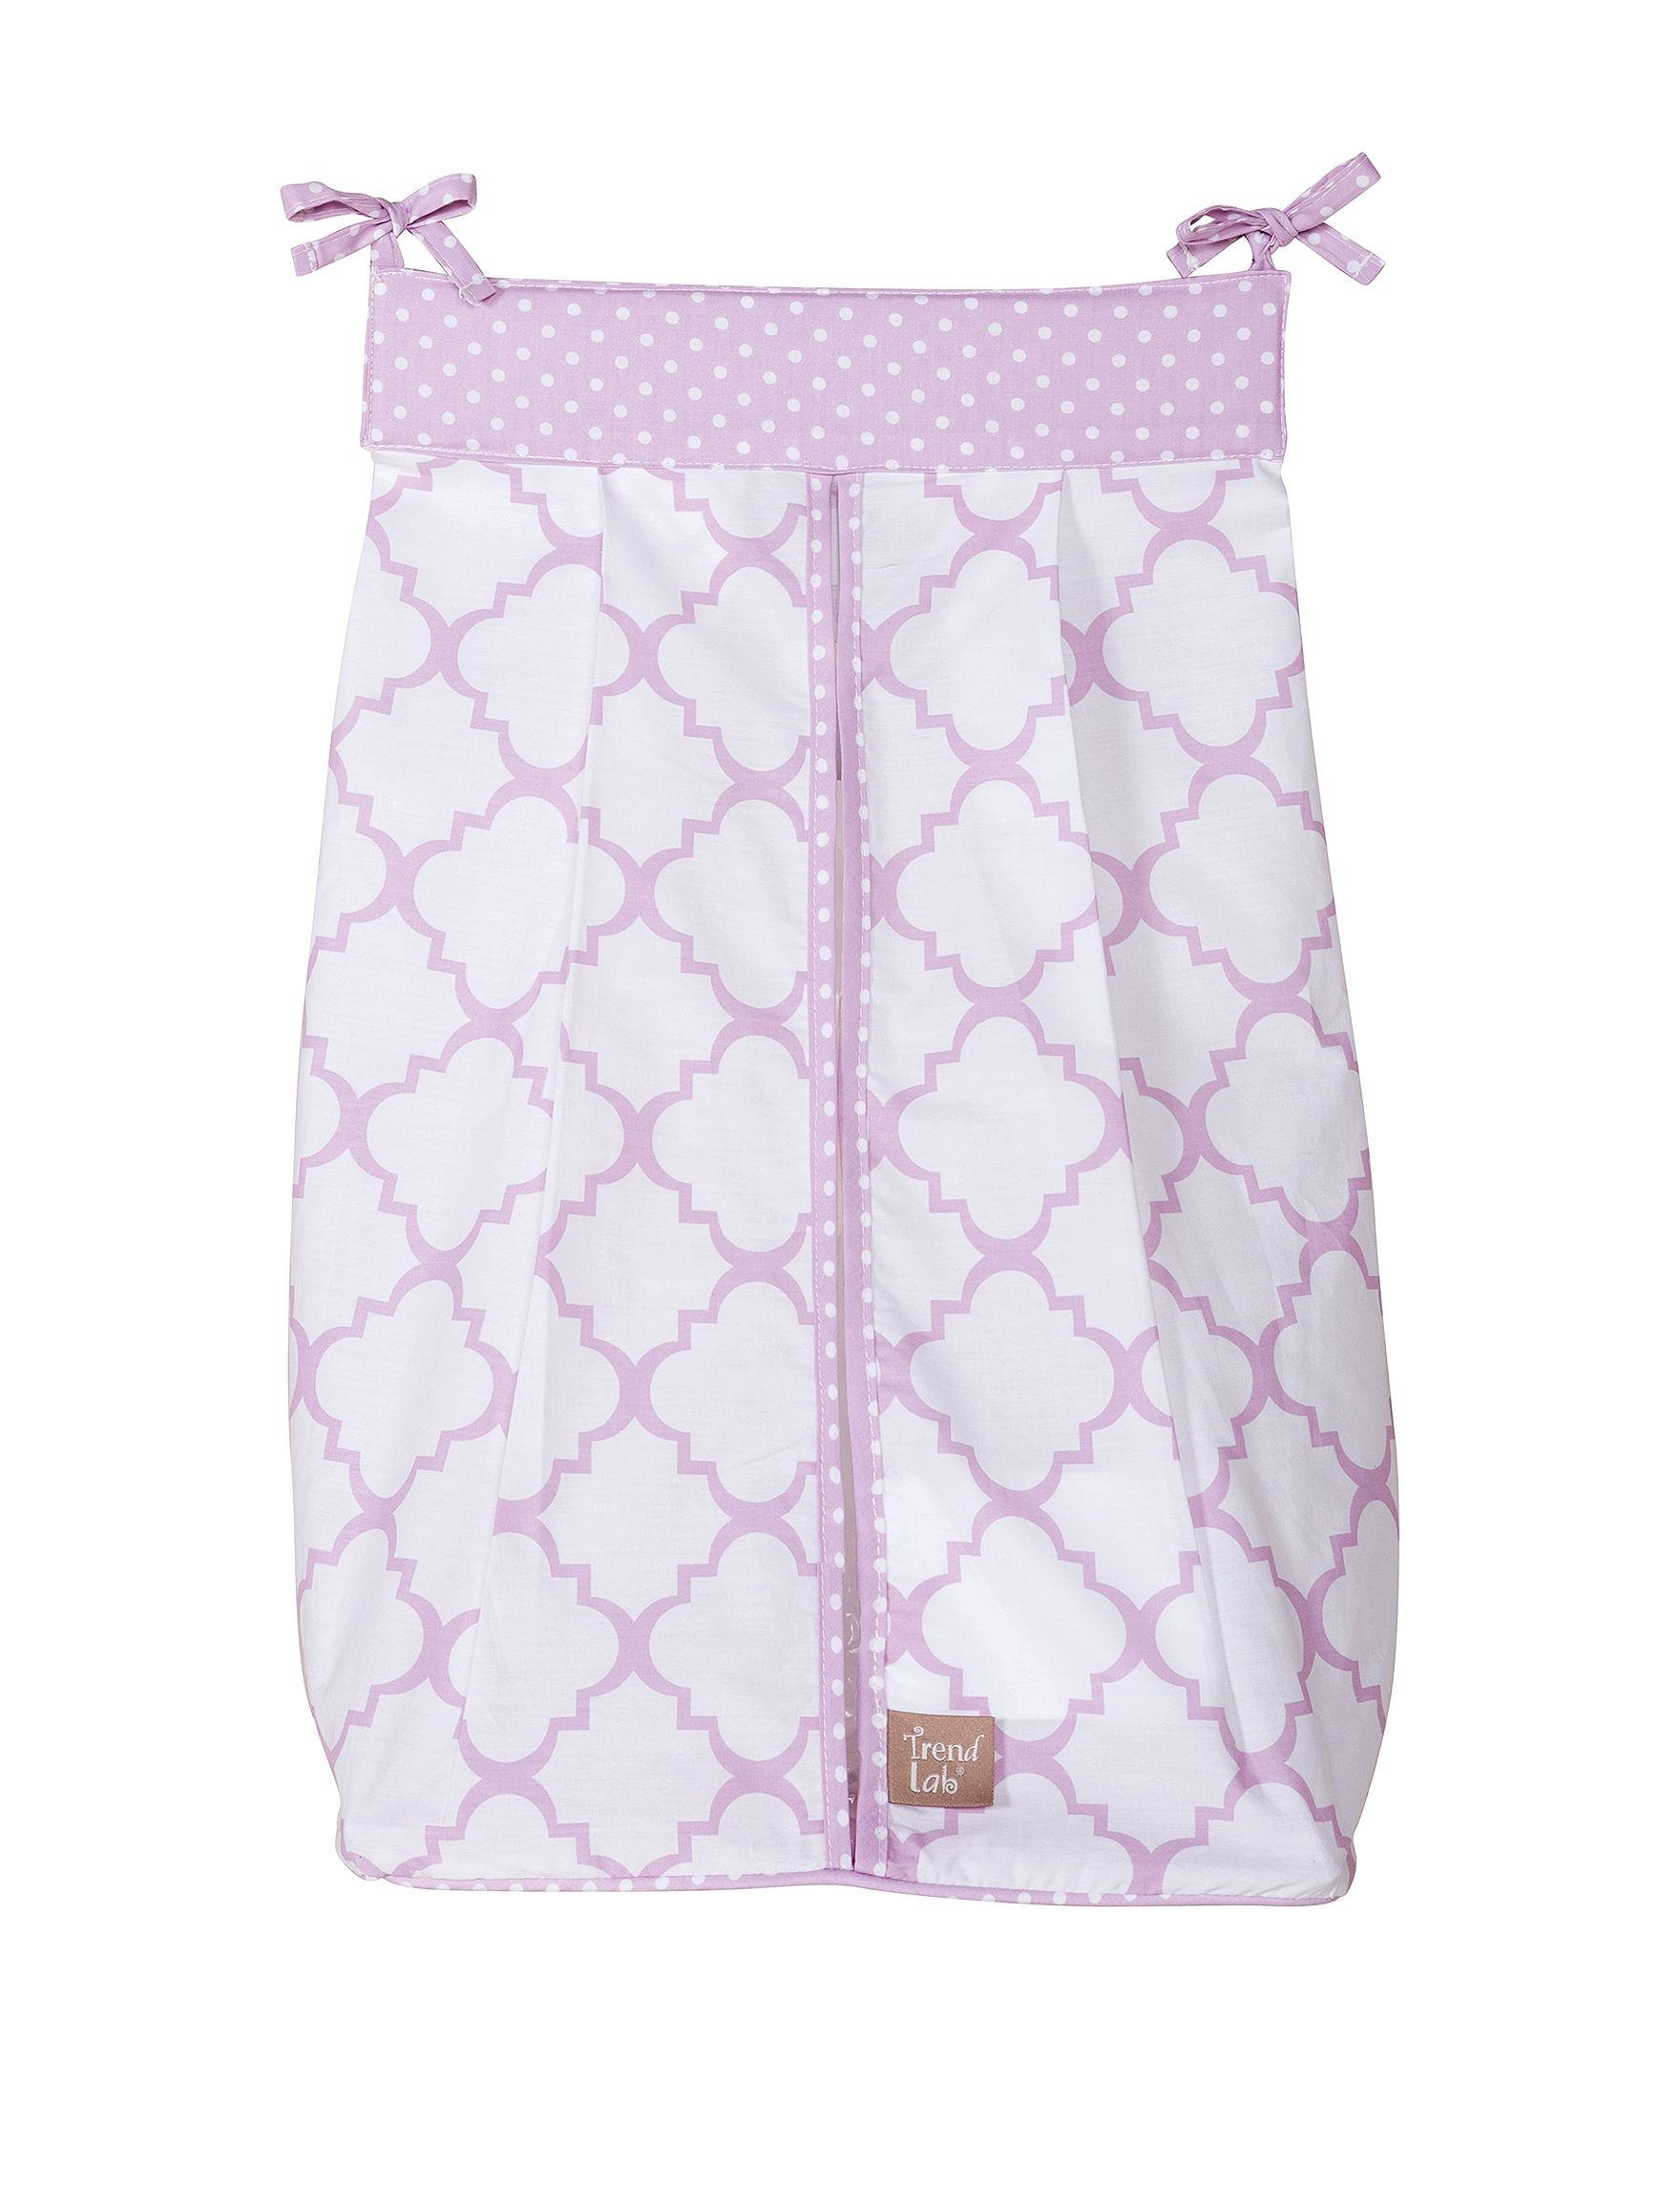 Trend Lab Purple / White Diaper Bags